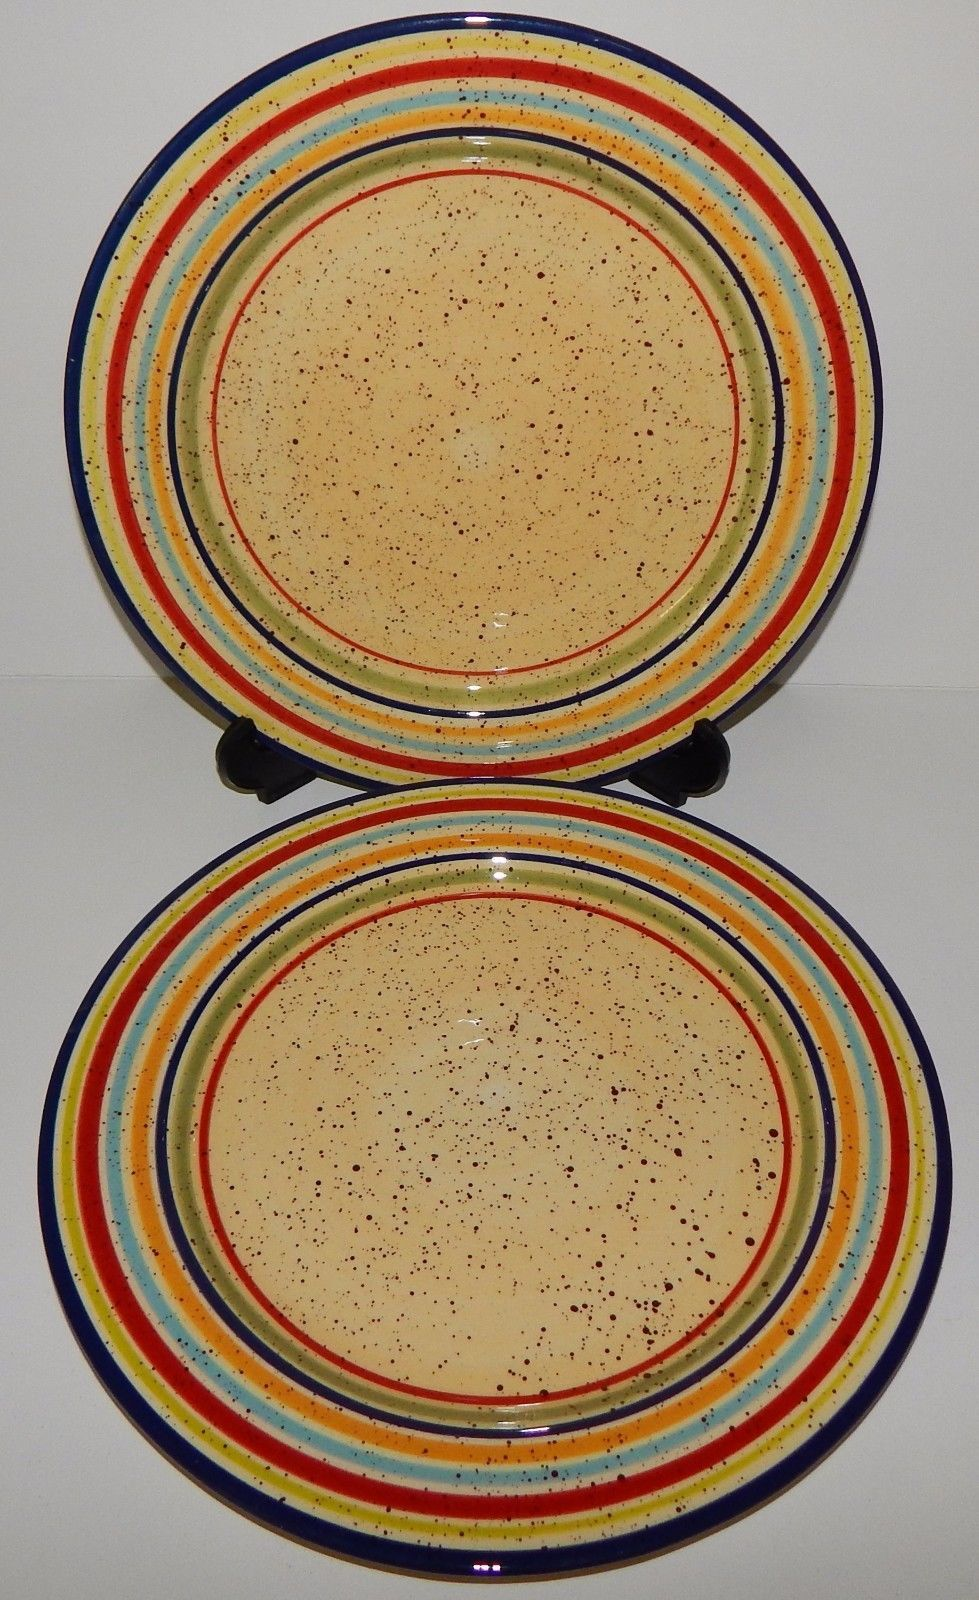 2 Pfaltzgraff Sedona Hand Painted Stripe and 31 similar items